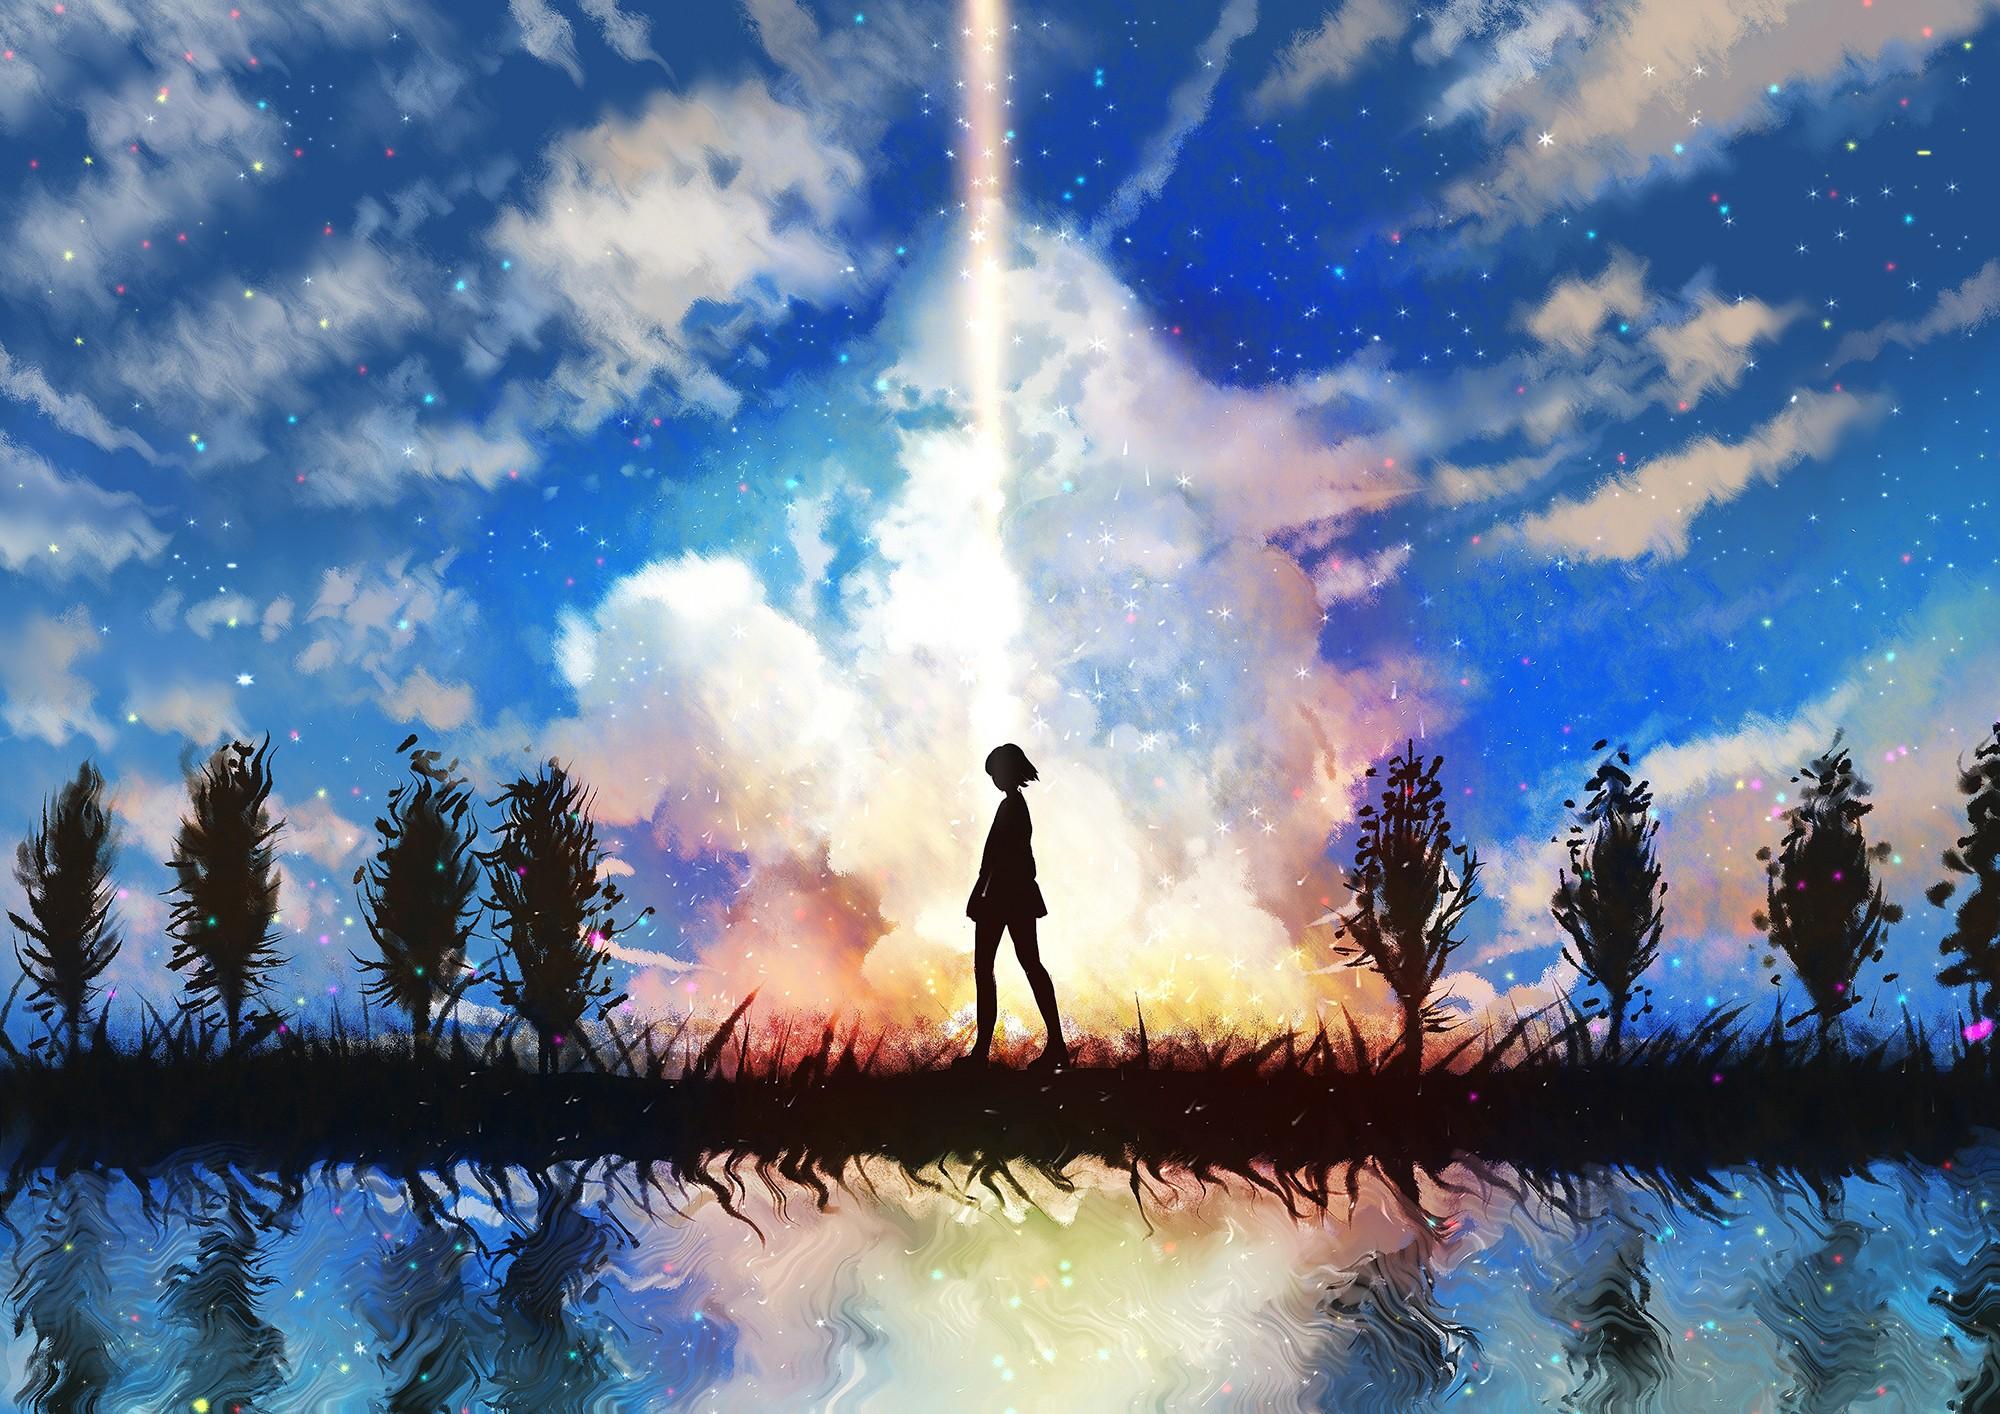 Wallpaper Sunlight Anime Girls Reflection Sky Evening